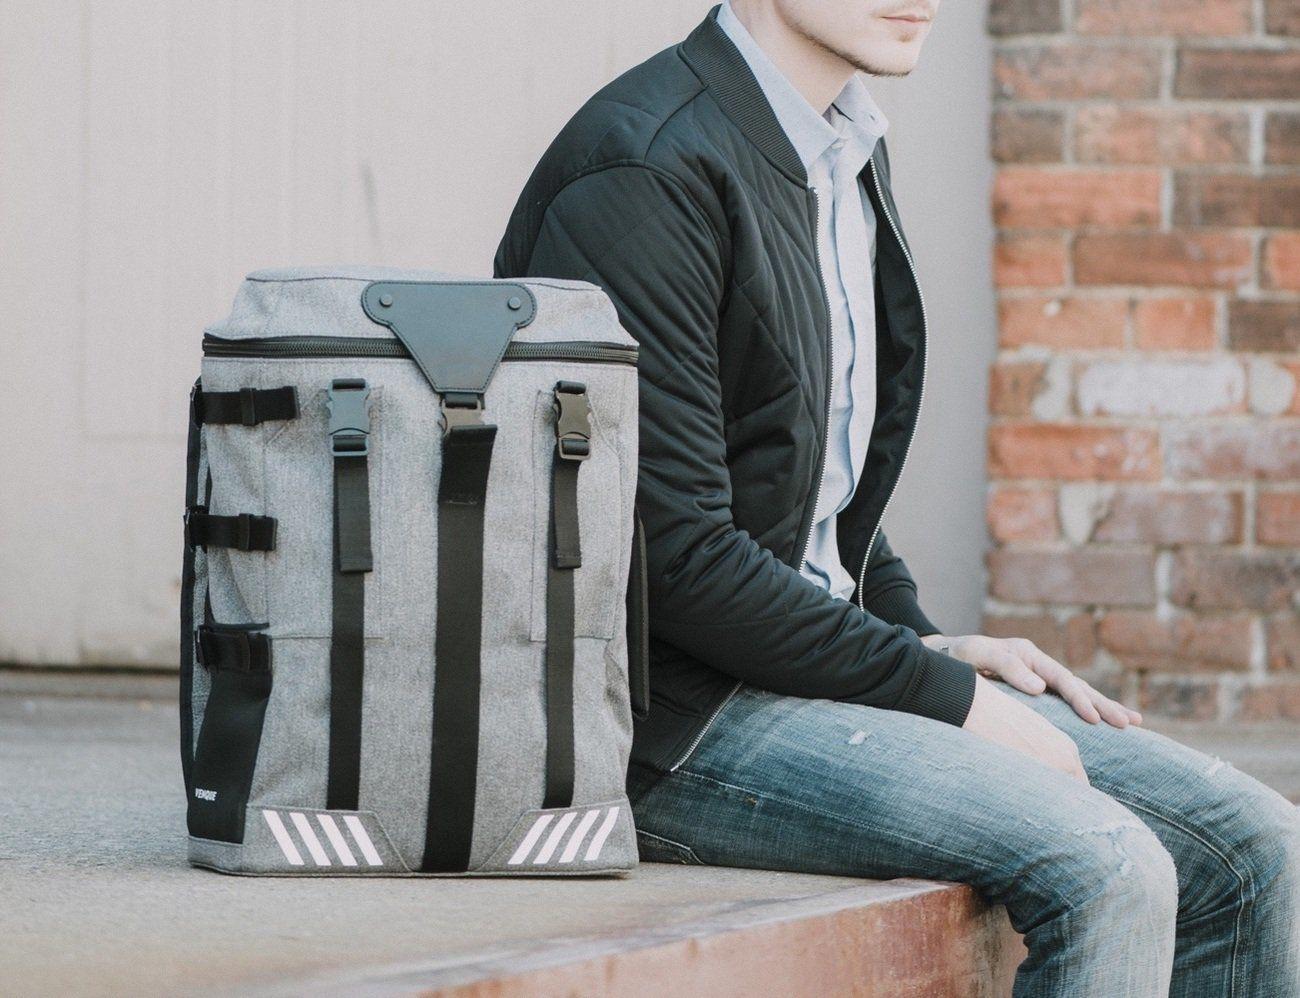 modular transformer A backpack